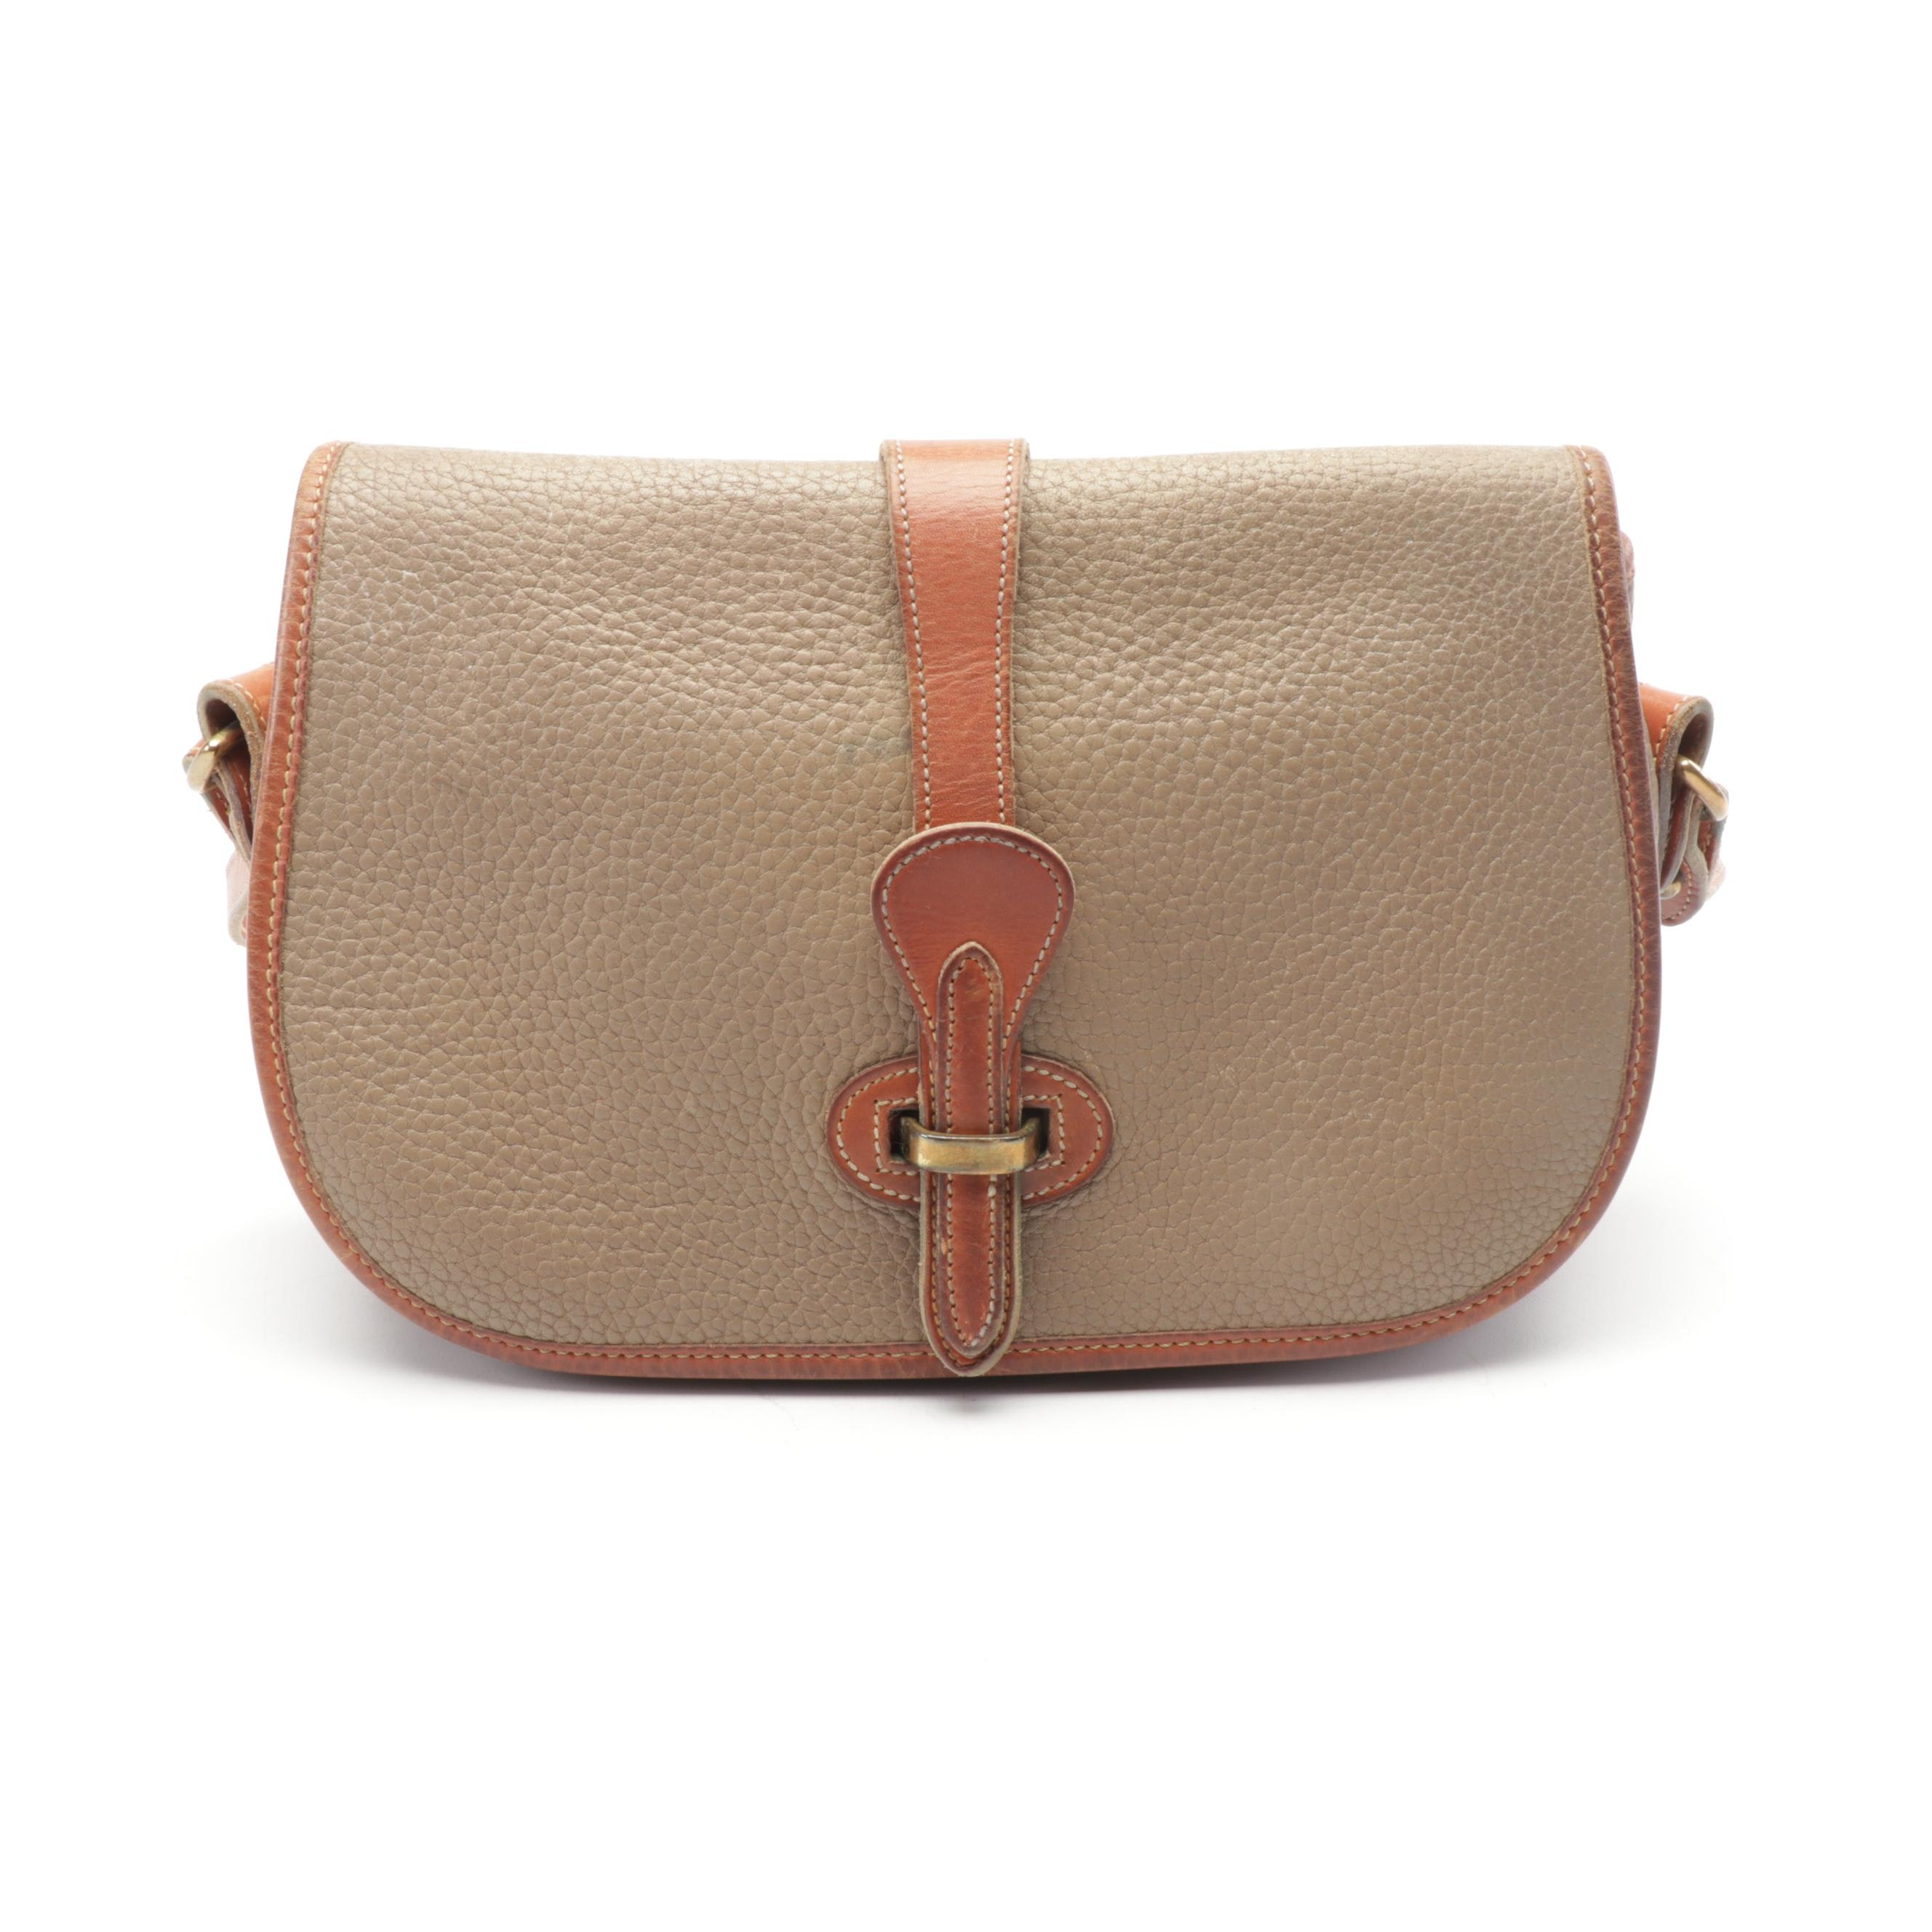 Dooney & Bourke All-Weather Leather Crossbody Saddle Bag, Vintage